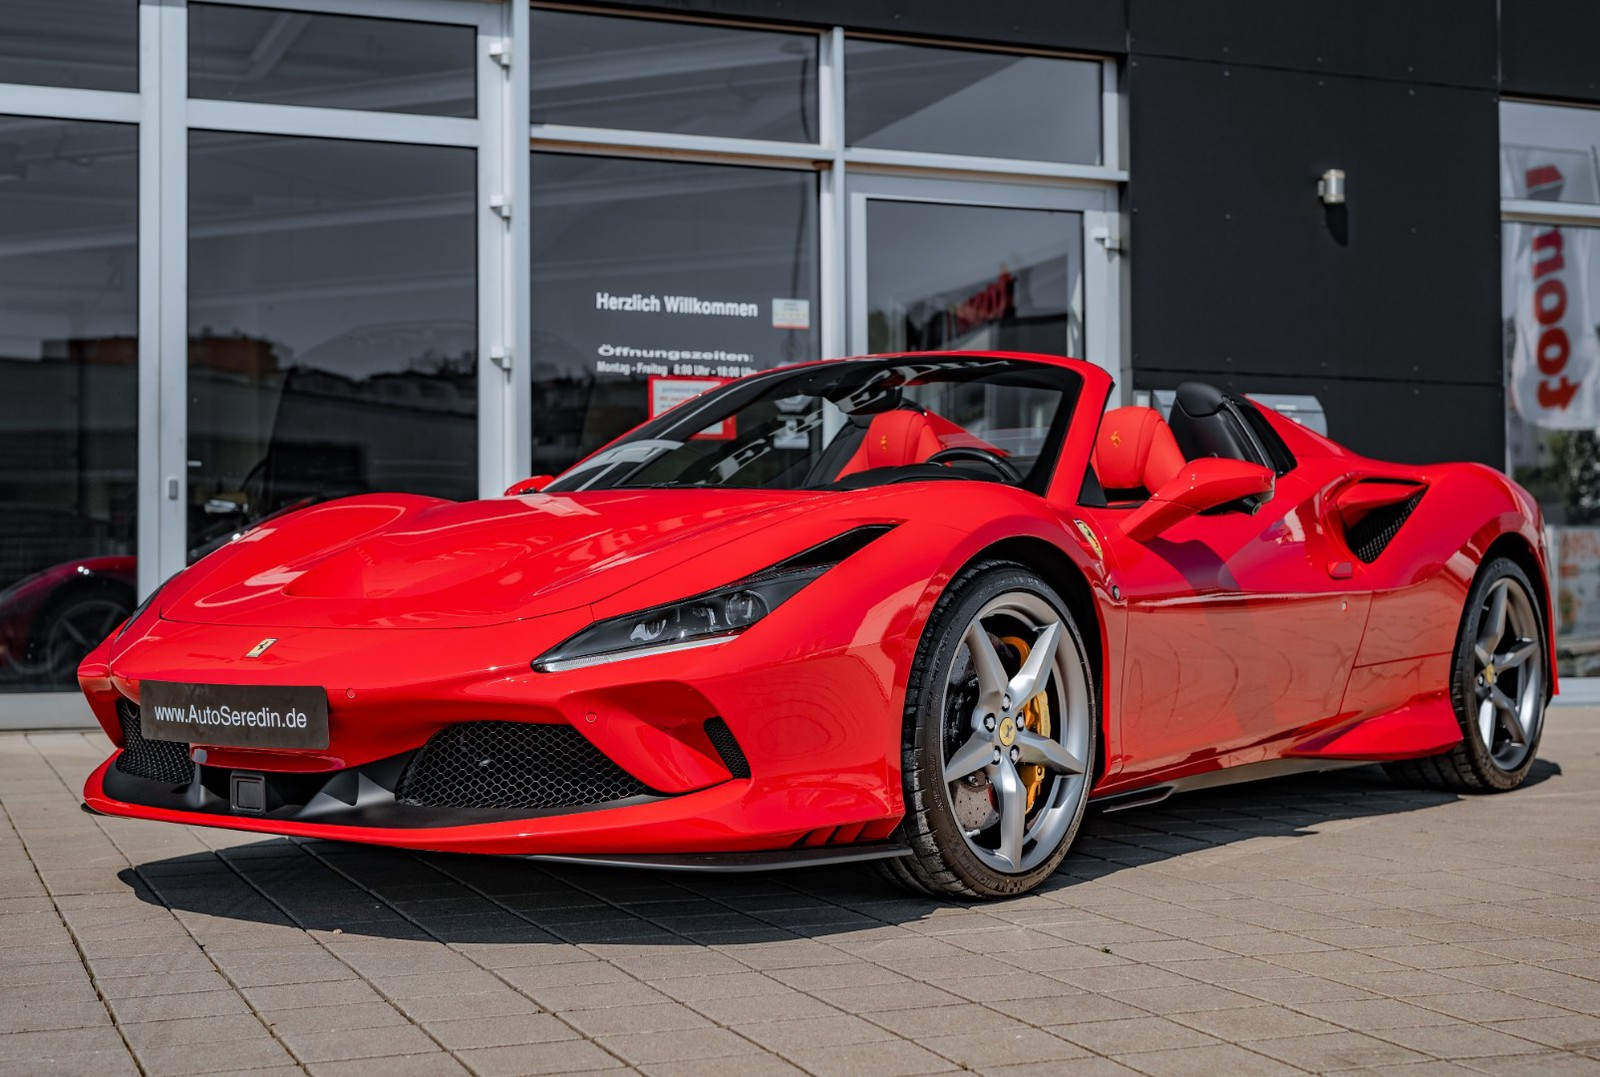 Ferrari F8 Spider New Buy In Hechingen Bei Stuttgart Price 371199 Eur Int Nr 20 308 Sold